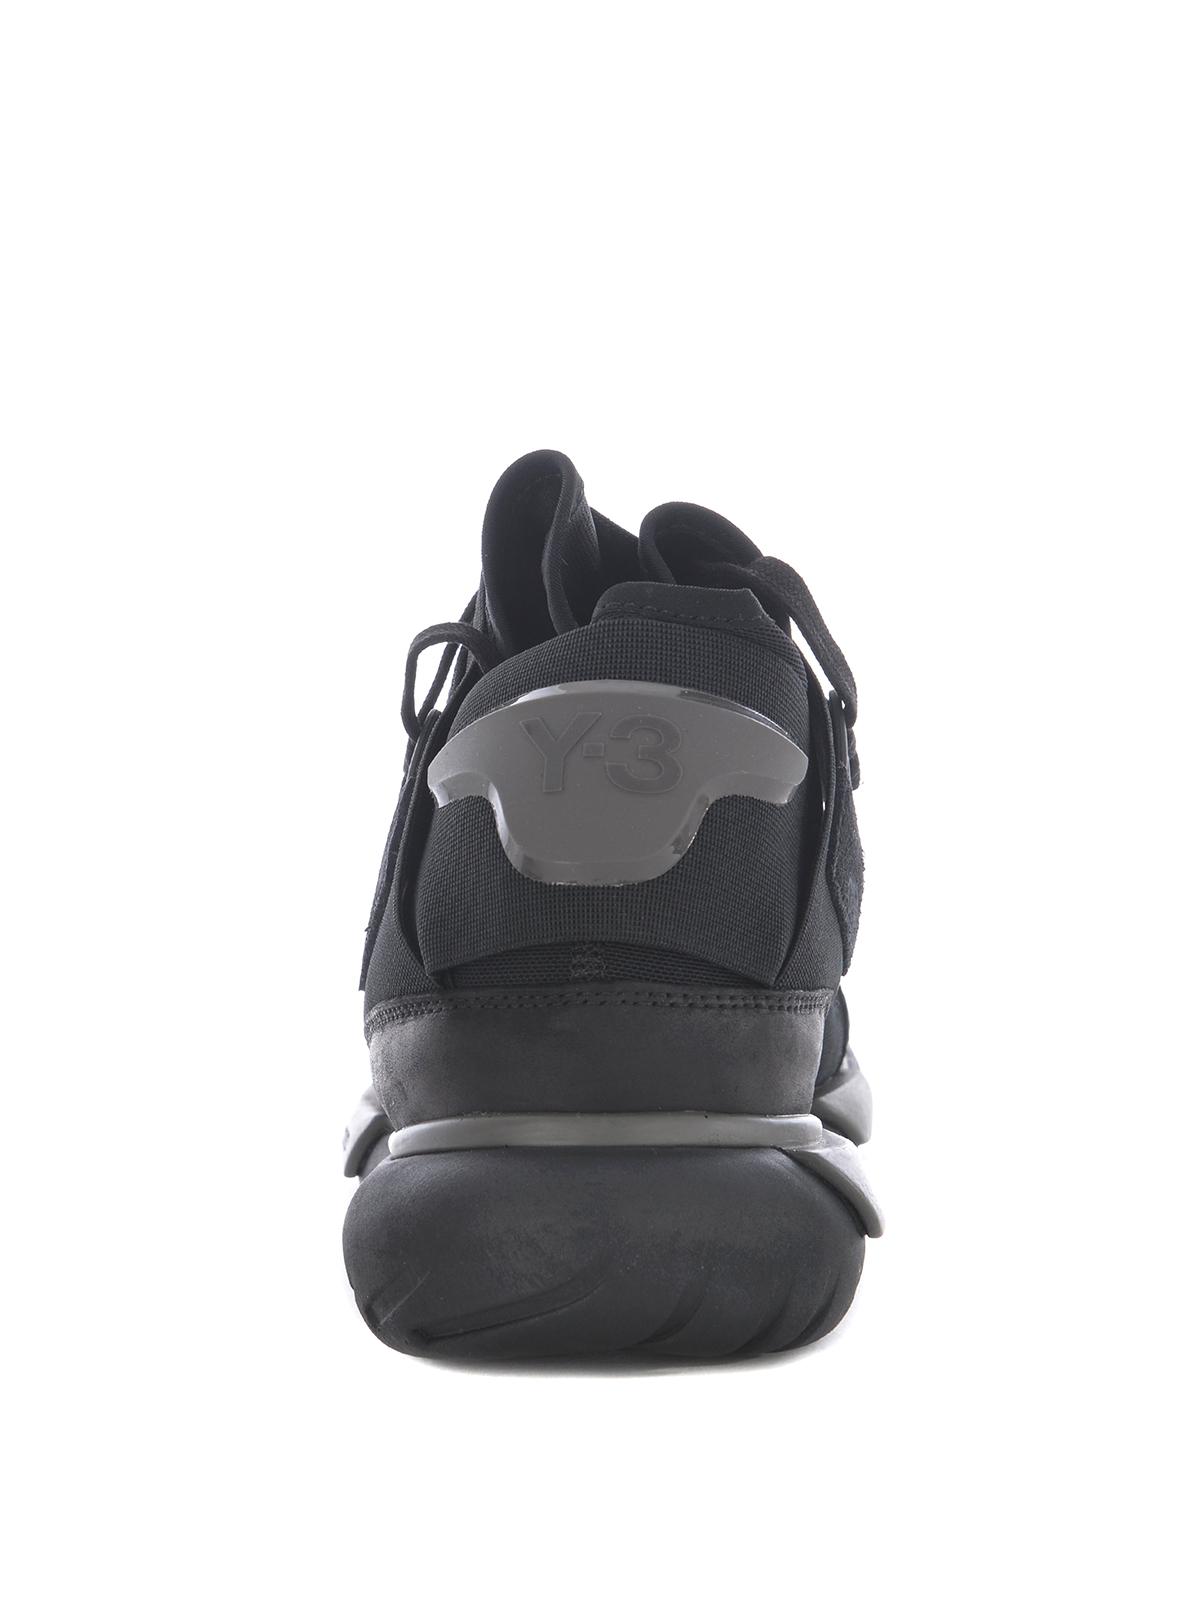 8d3dfe9b1 Adidas Y-3 - Qasa High elastic bands sneakers - trainers - CP9854